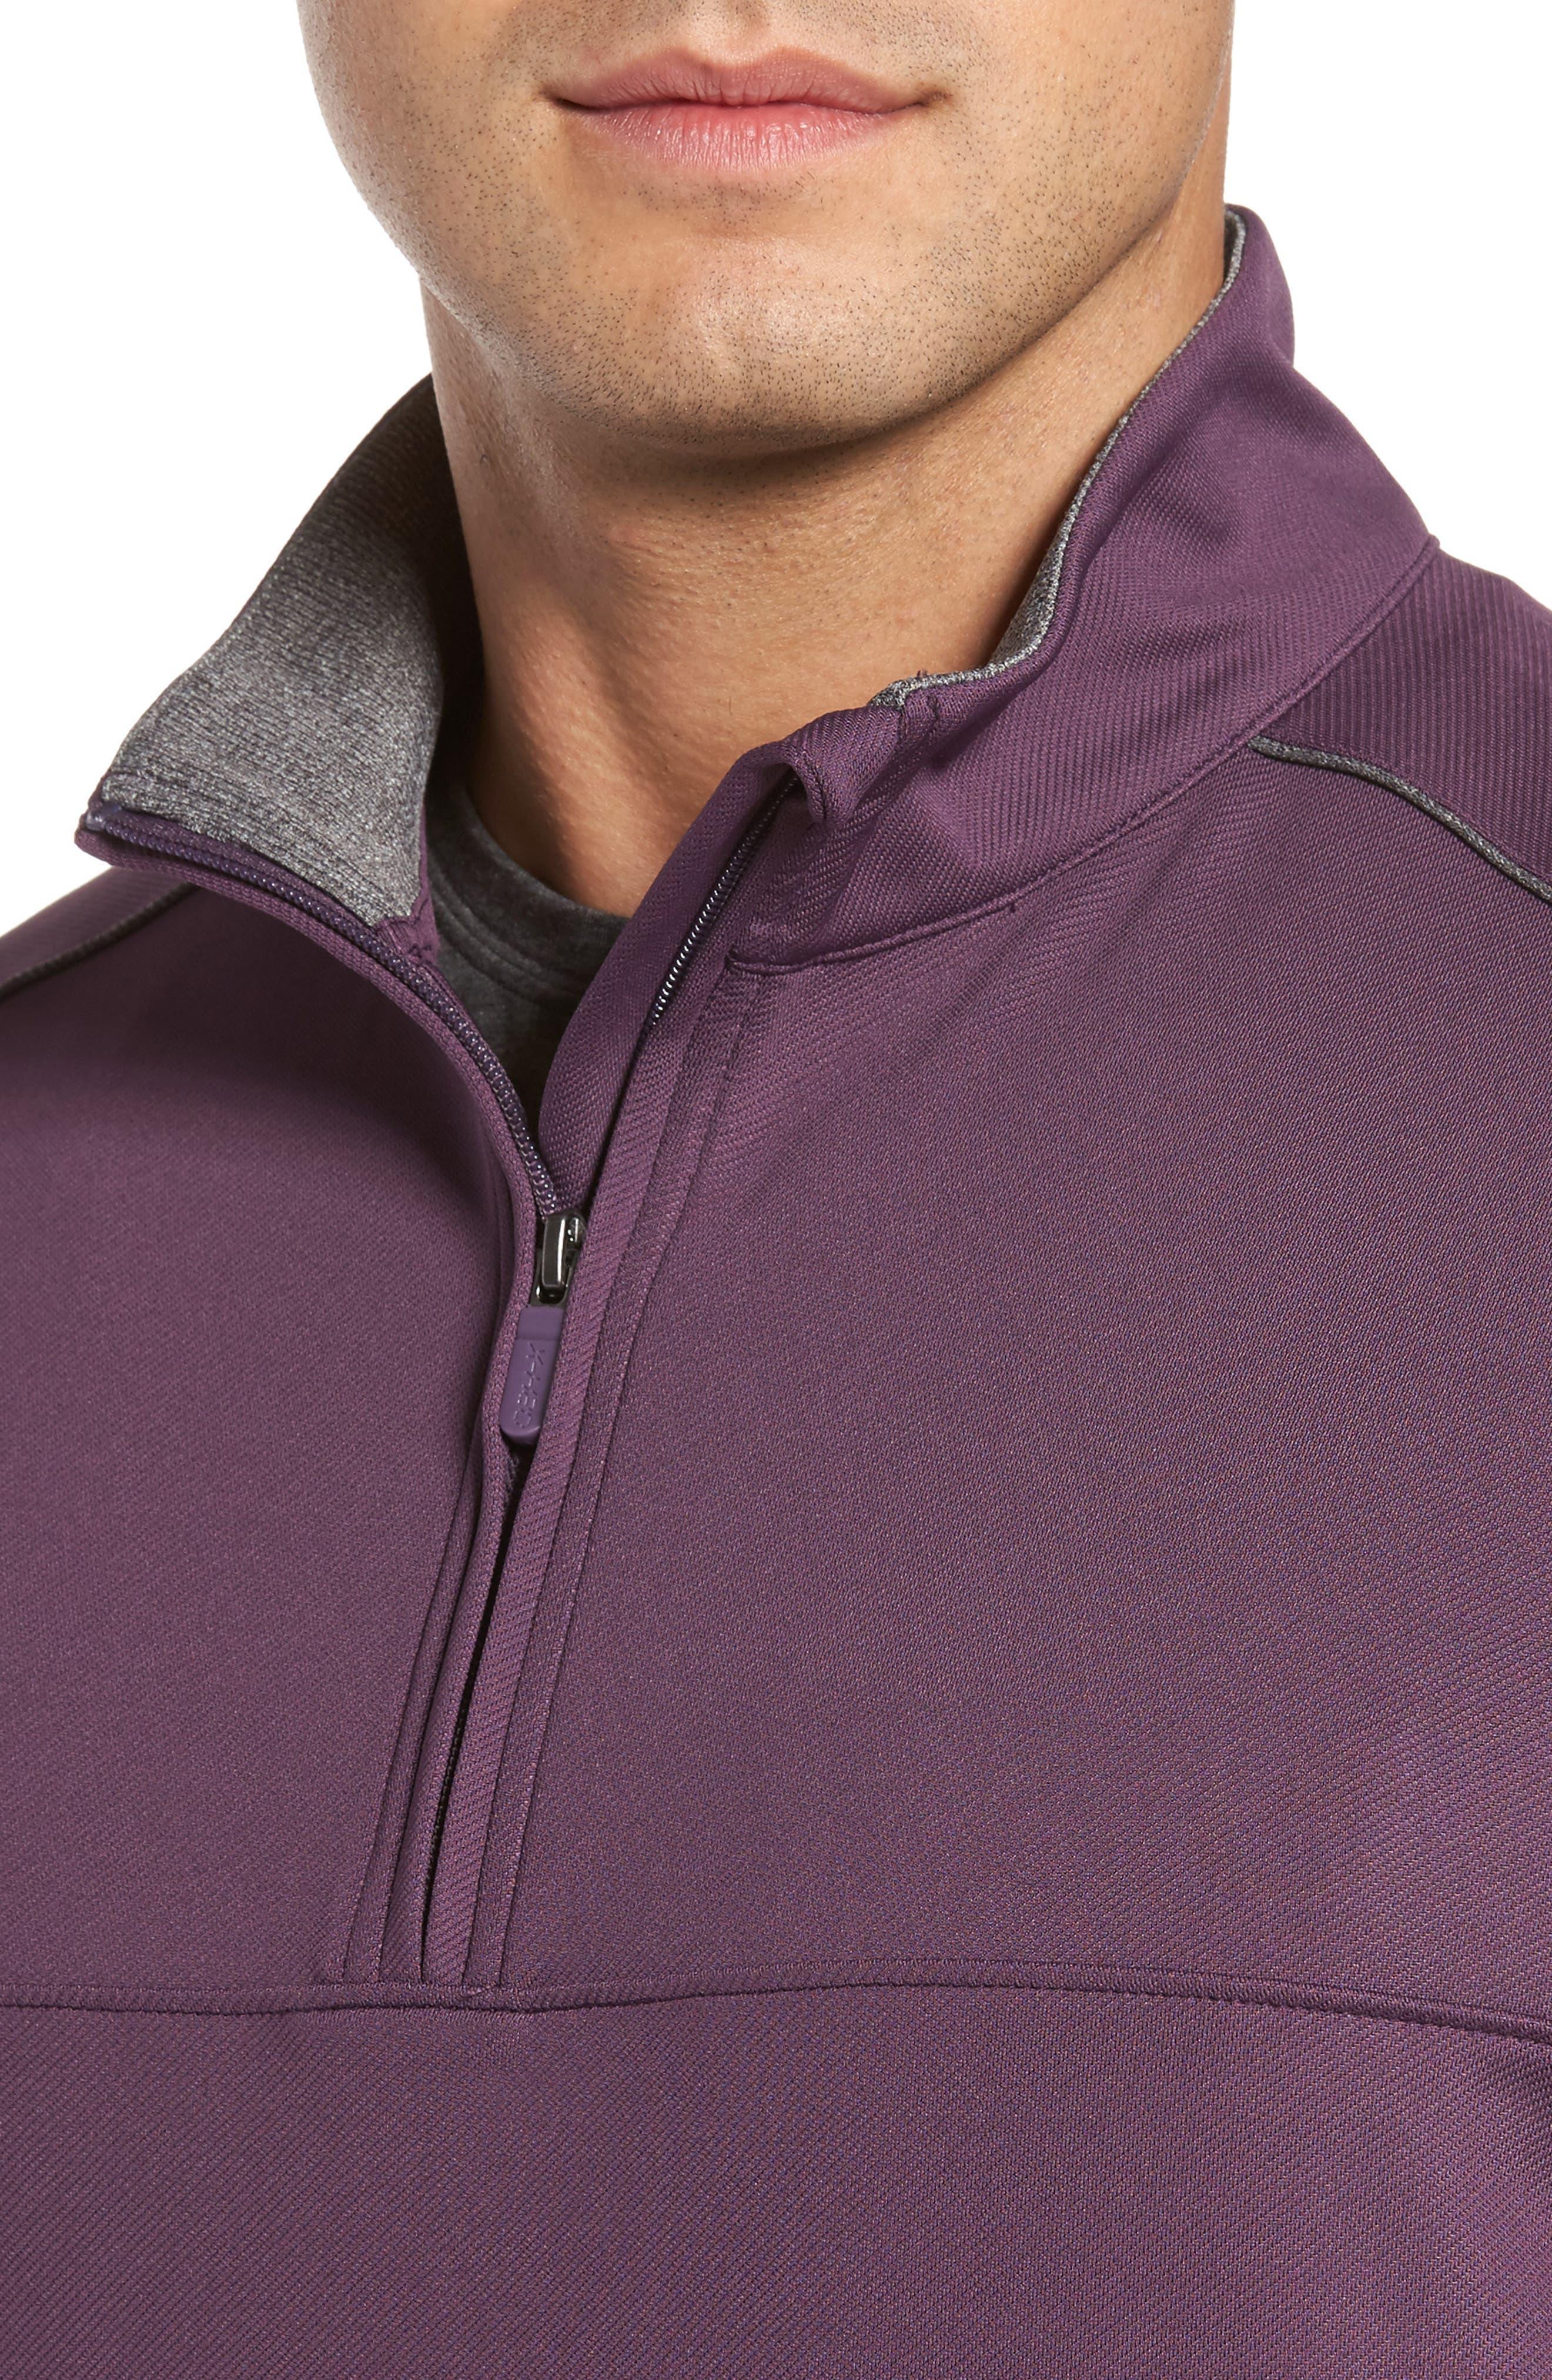 XH20 Banded Bottom Pullover,                             Alternate thumbnail 4, color,                             Blackberry